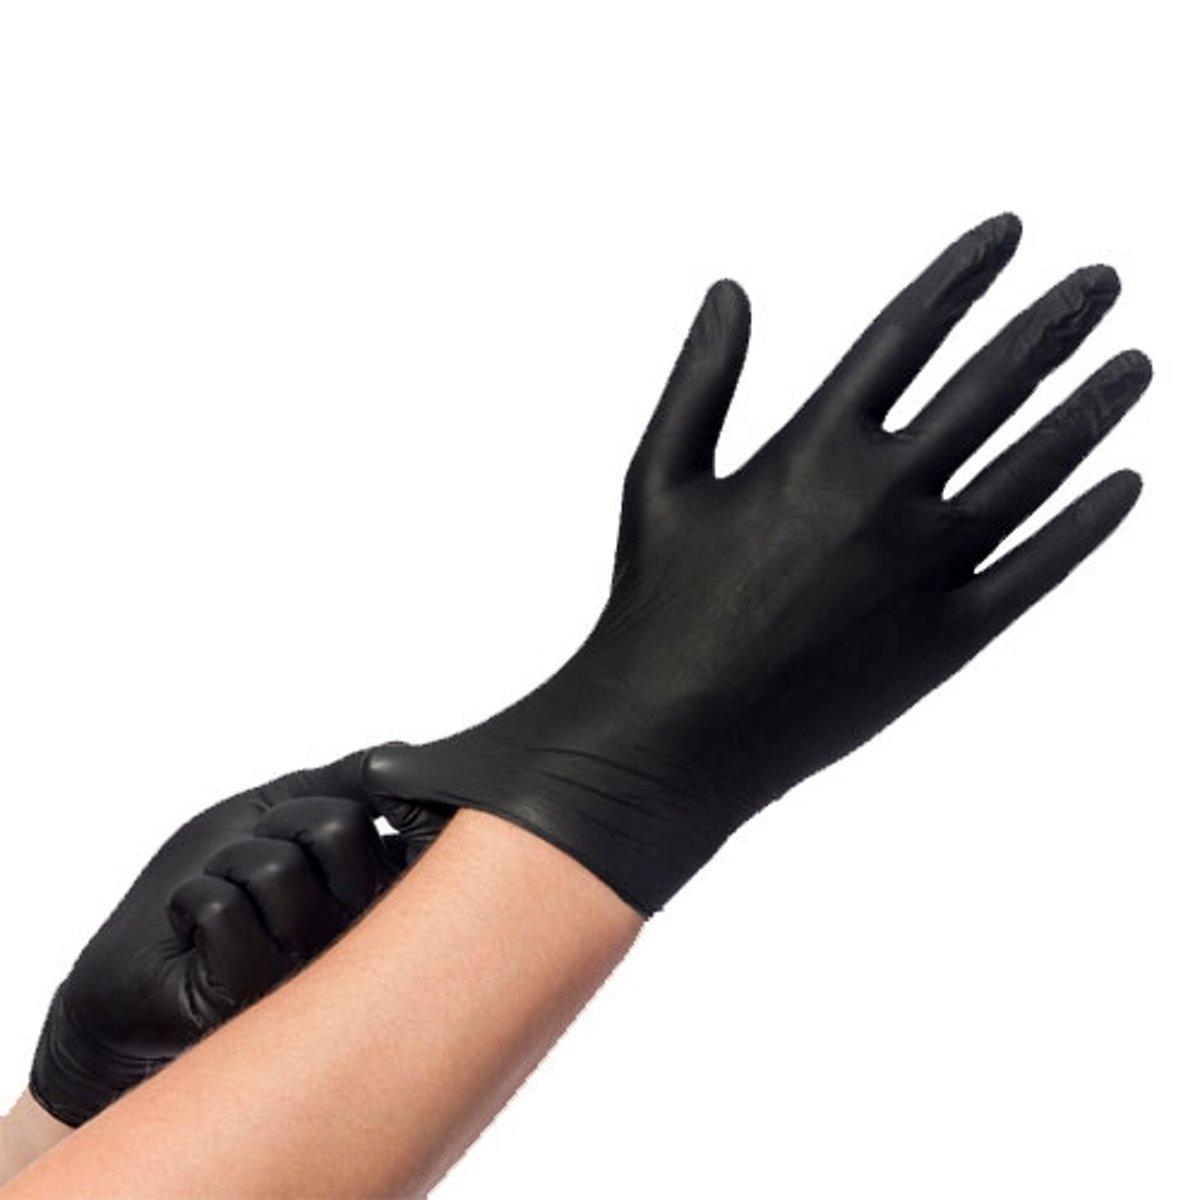 Veronica NAIL-PRODUCTS Nitriel handschoenen ZWART Easyglide & grip, maat M voor nagelstyliste. Nitriel handschoenen voor manicure en pedicure behandelingen! Hygiëne in uw nagelsalon! kopen